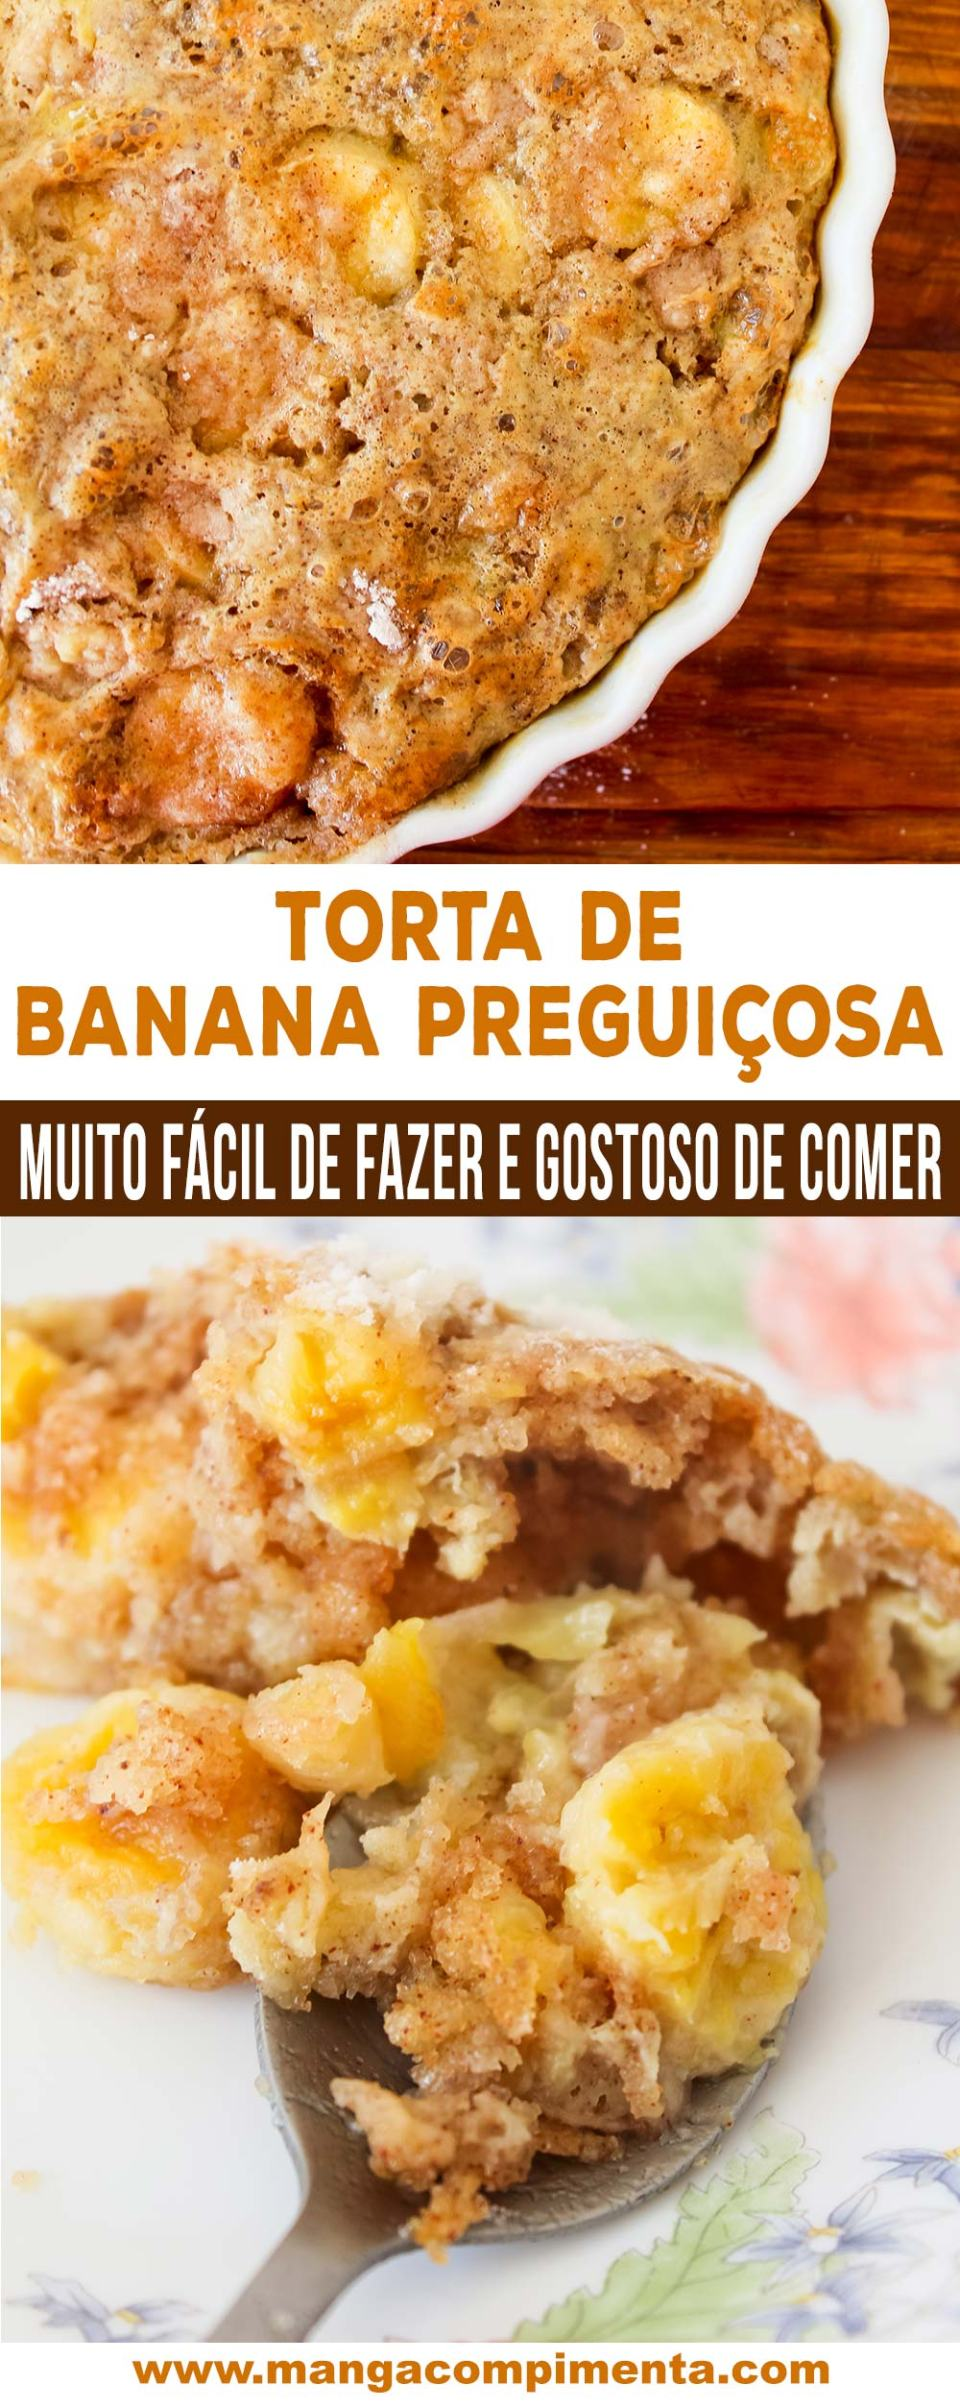 Torta de Banana Preguiçosa | Fácil de fazer e delicioso de comer, prepare para o chá da tarde!